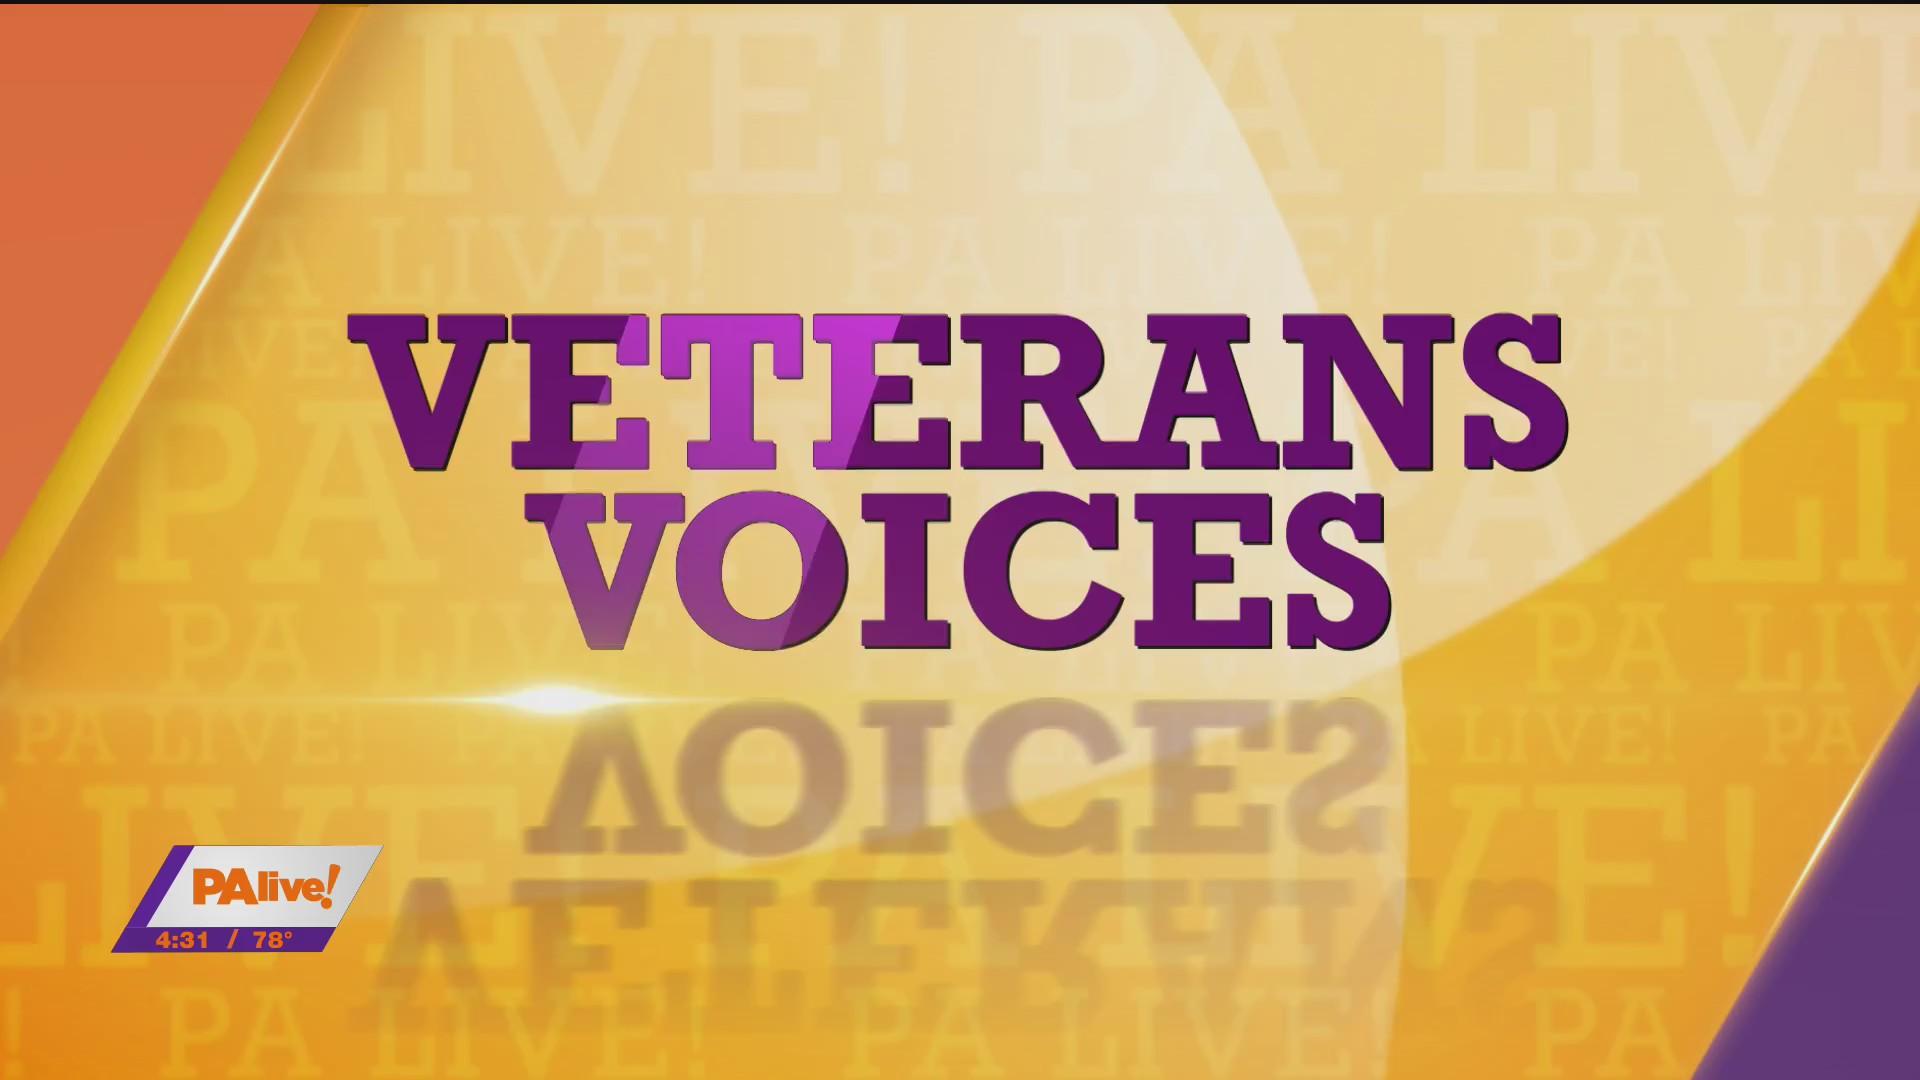 PAlive! Veteran Advocate August 19, 2020